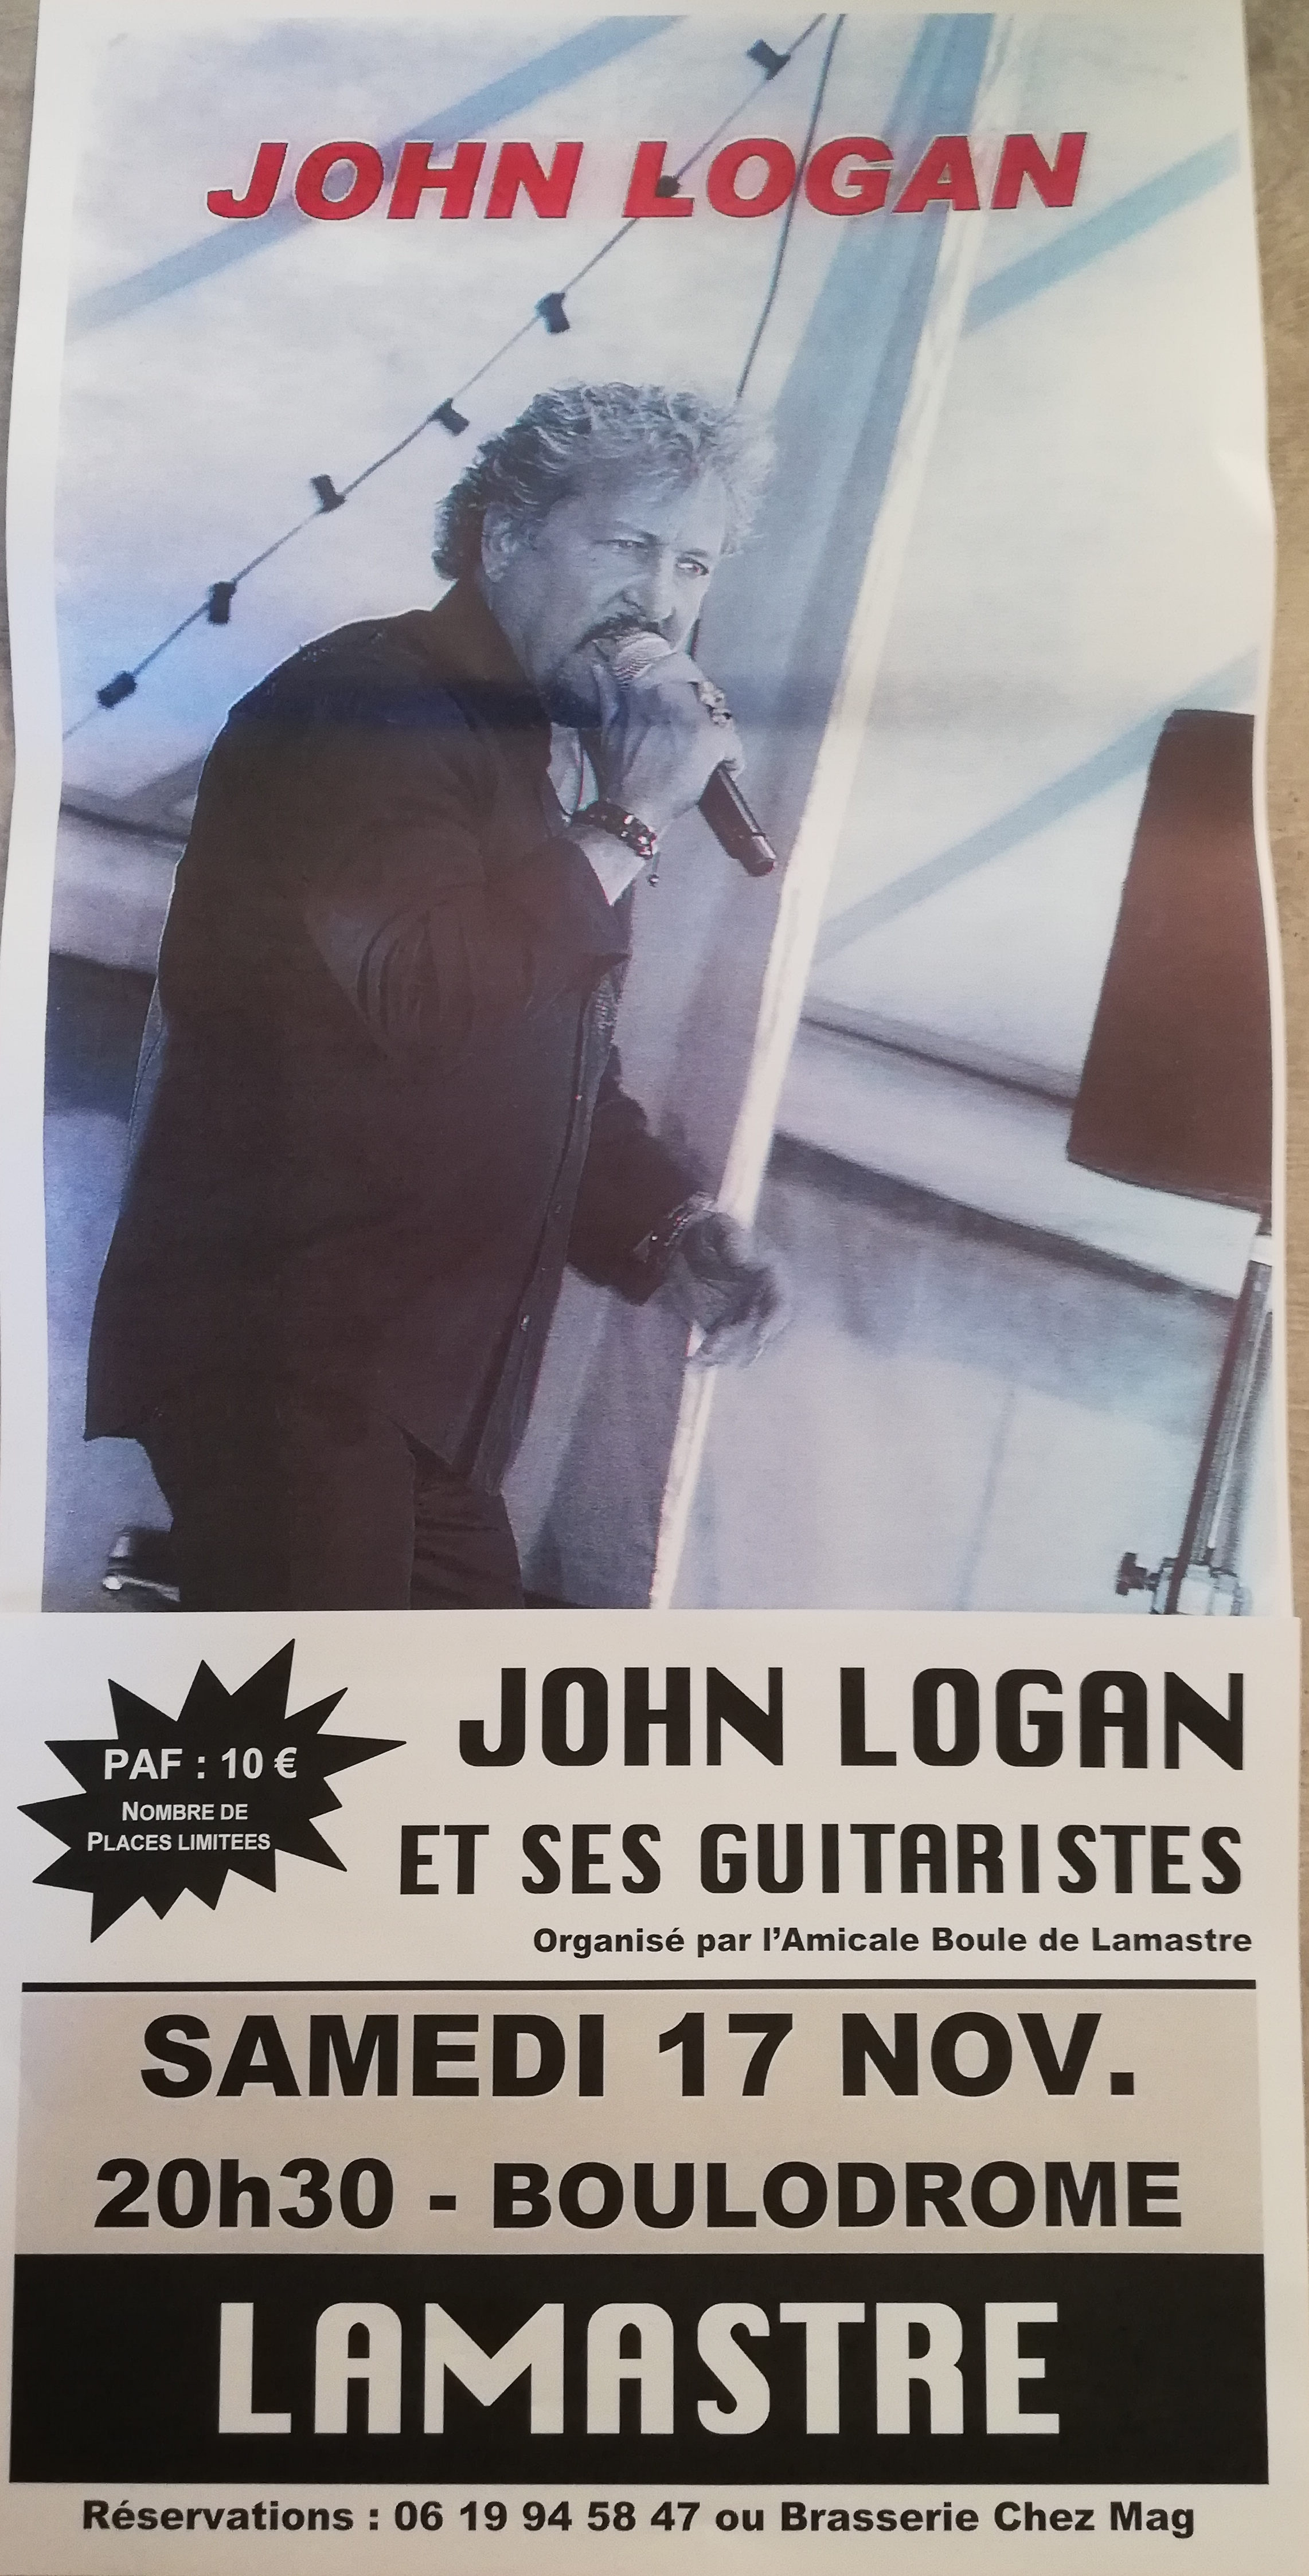 John Logan et ses guitaristes lamastre boule